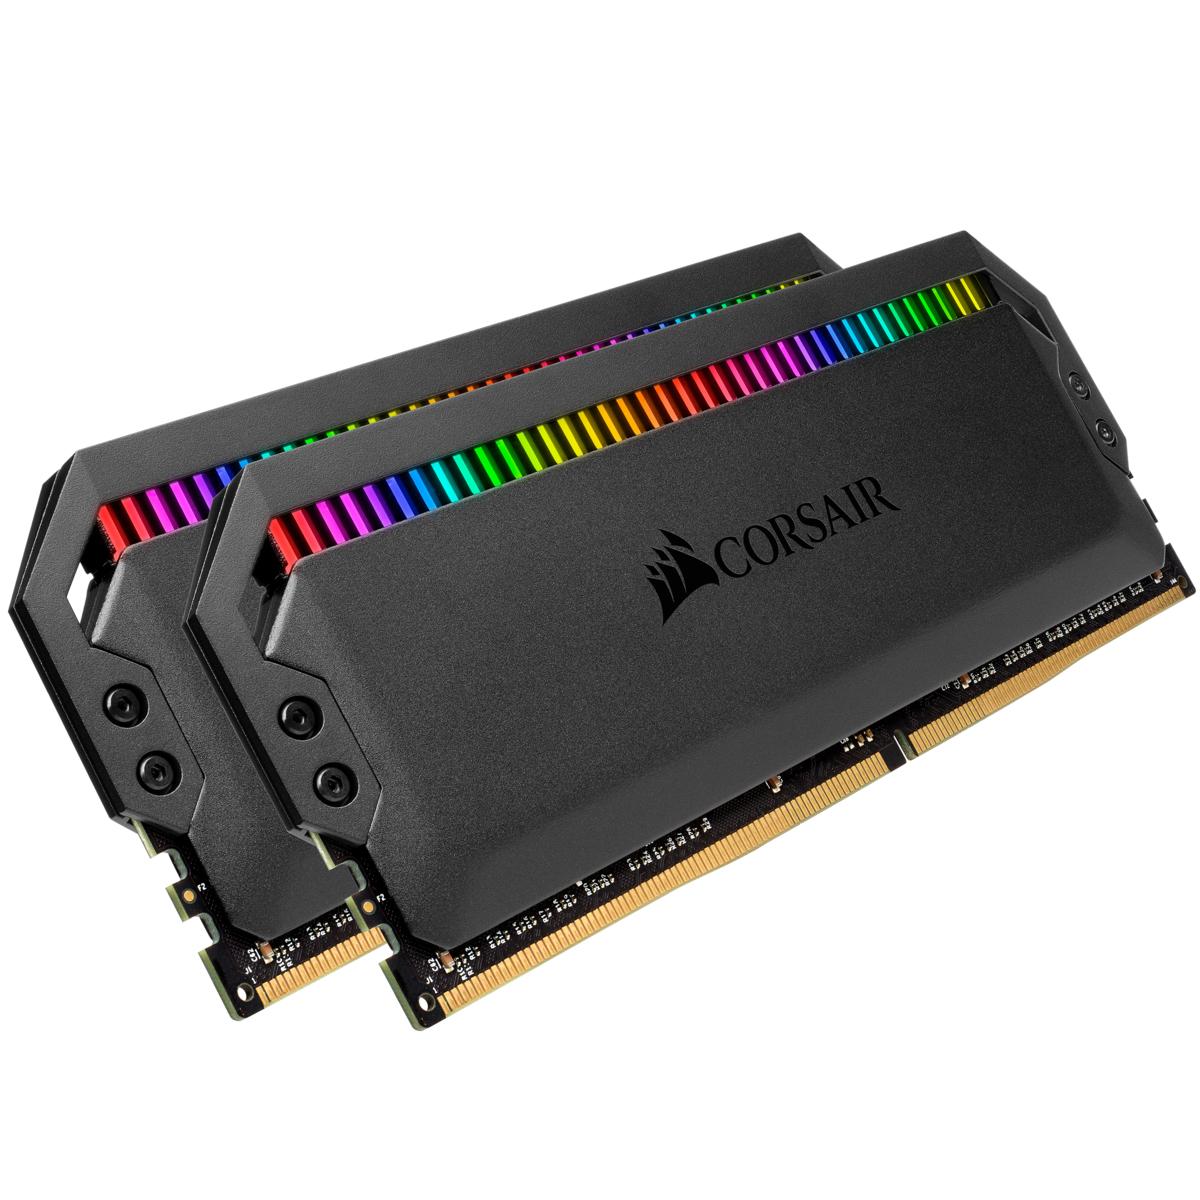 Vorschau: Corsair Dominator CMT32GX4M2D3600C18 - 32 GB - 2 x 16 GB - DDR4 - 3600 MHz